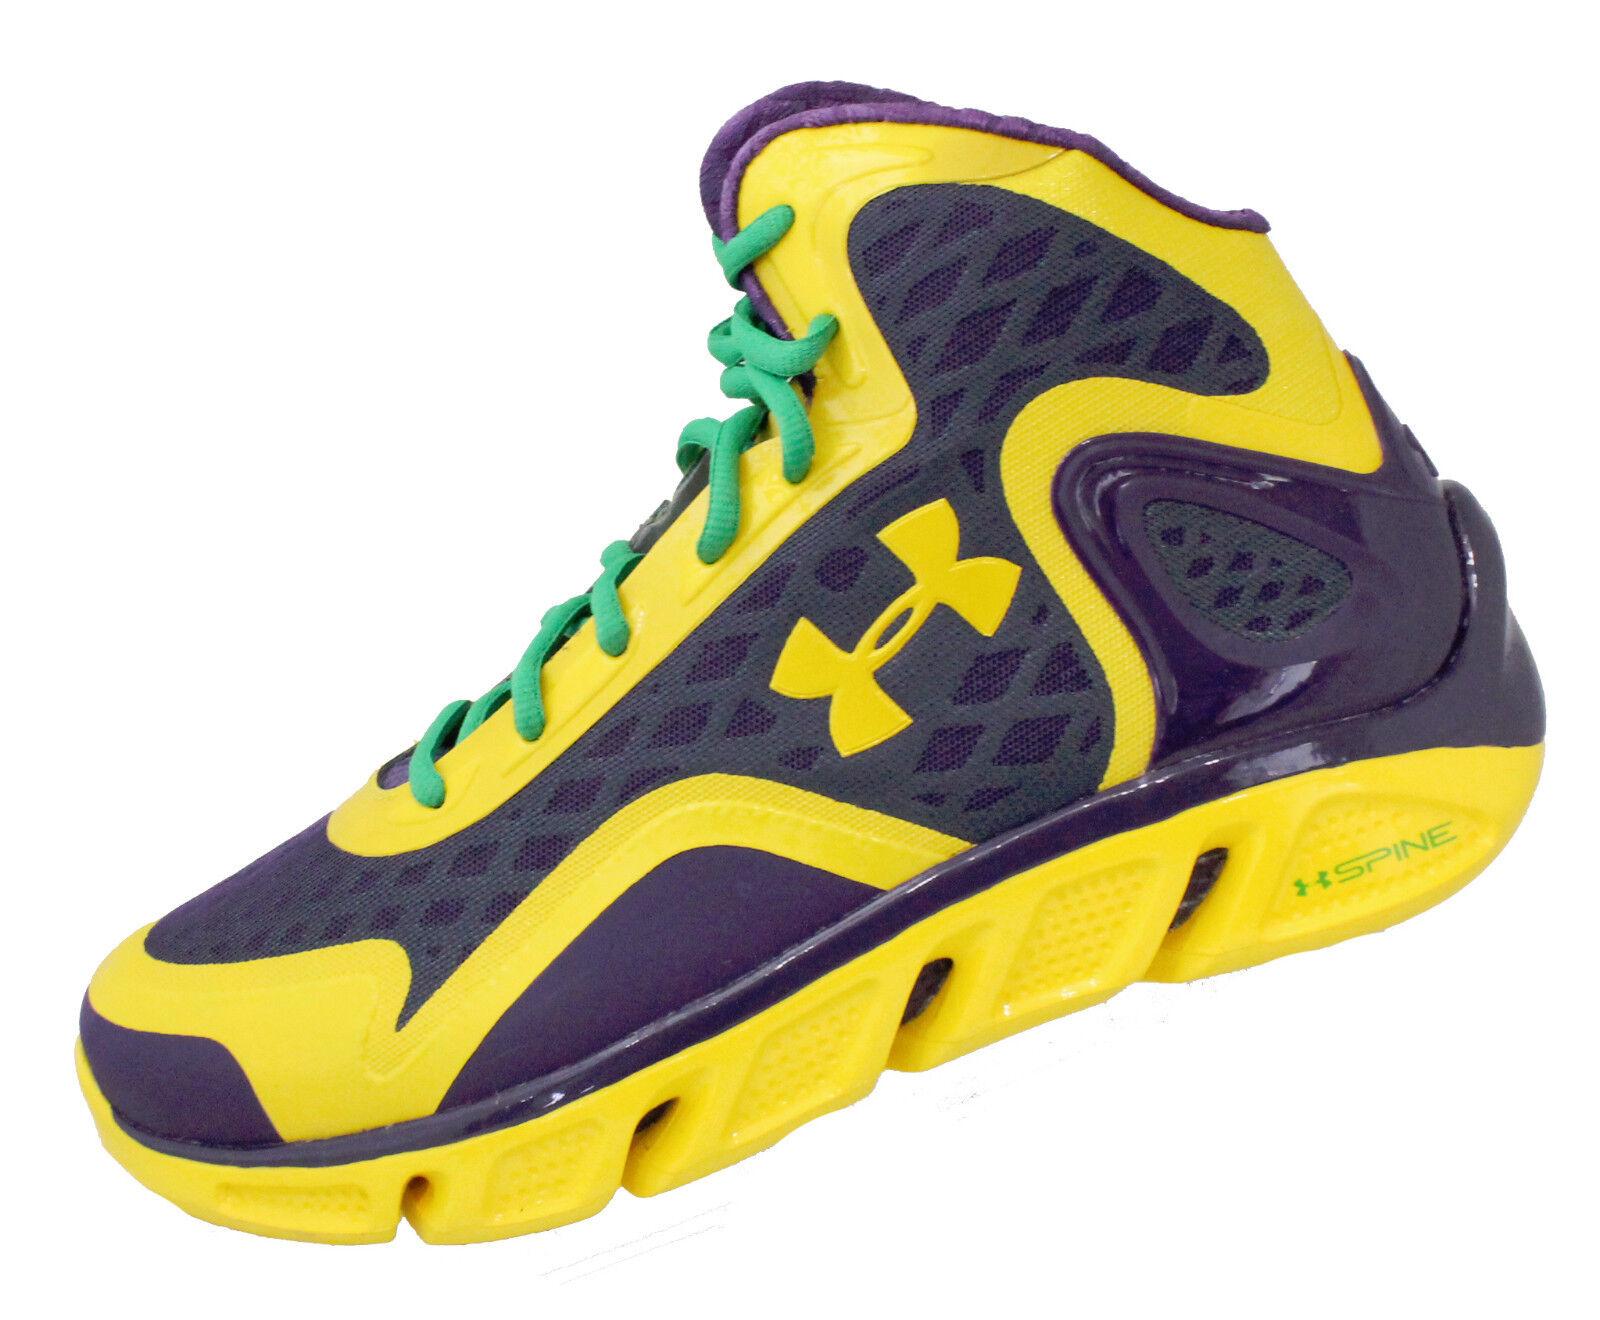 6a20dc74250a ... Mens Under Armour TB Spine Bionic Basketball Shoe - - - 1240728 d55d19  ...